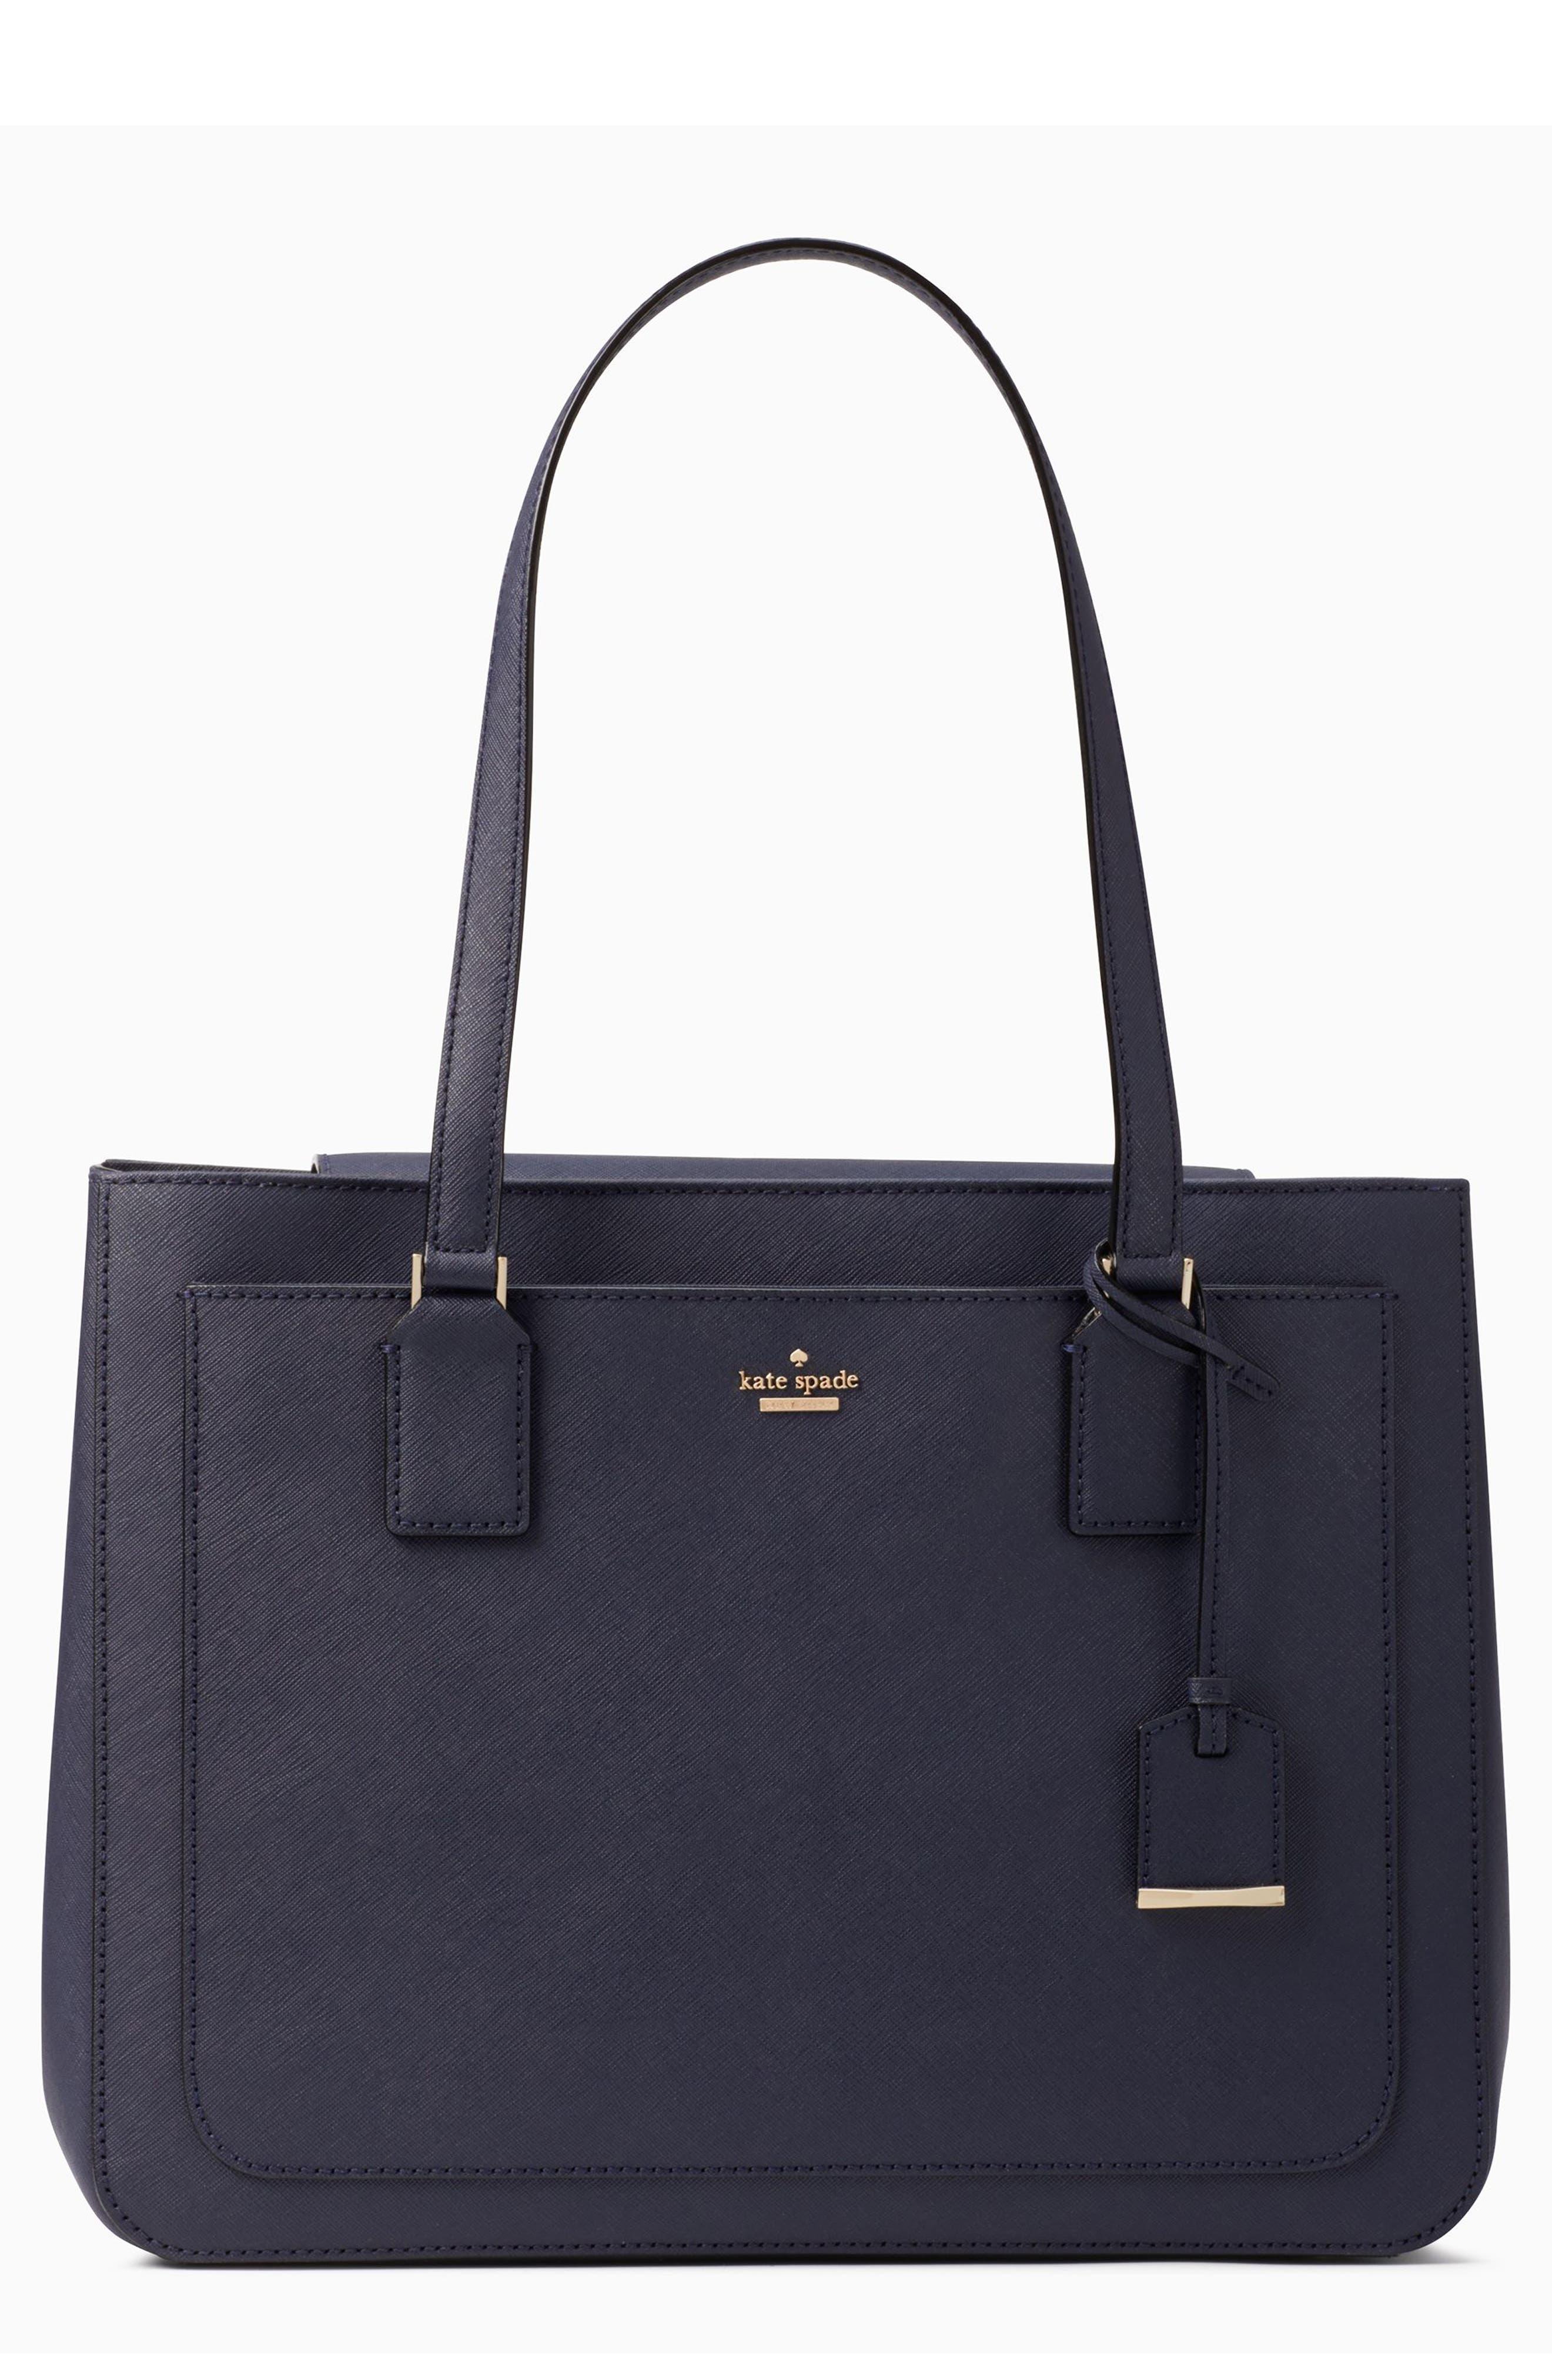 cameron street - zooey leather tote,                         Main,                         color, Blazer Blue/ Tusk/ Black